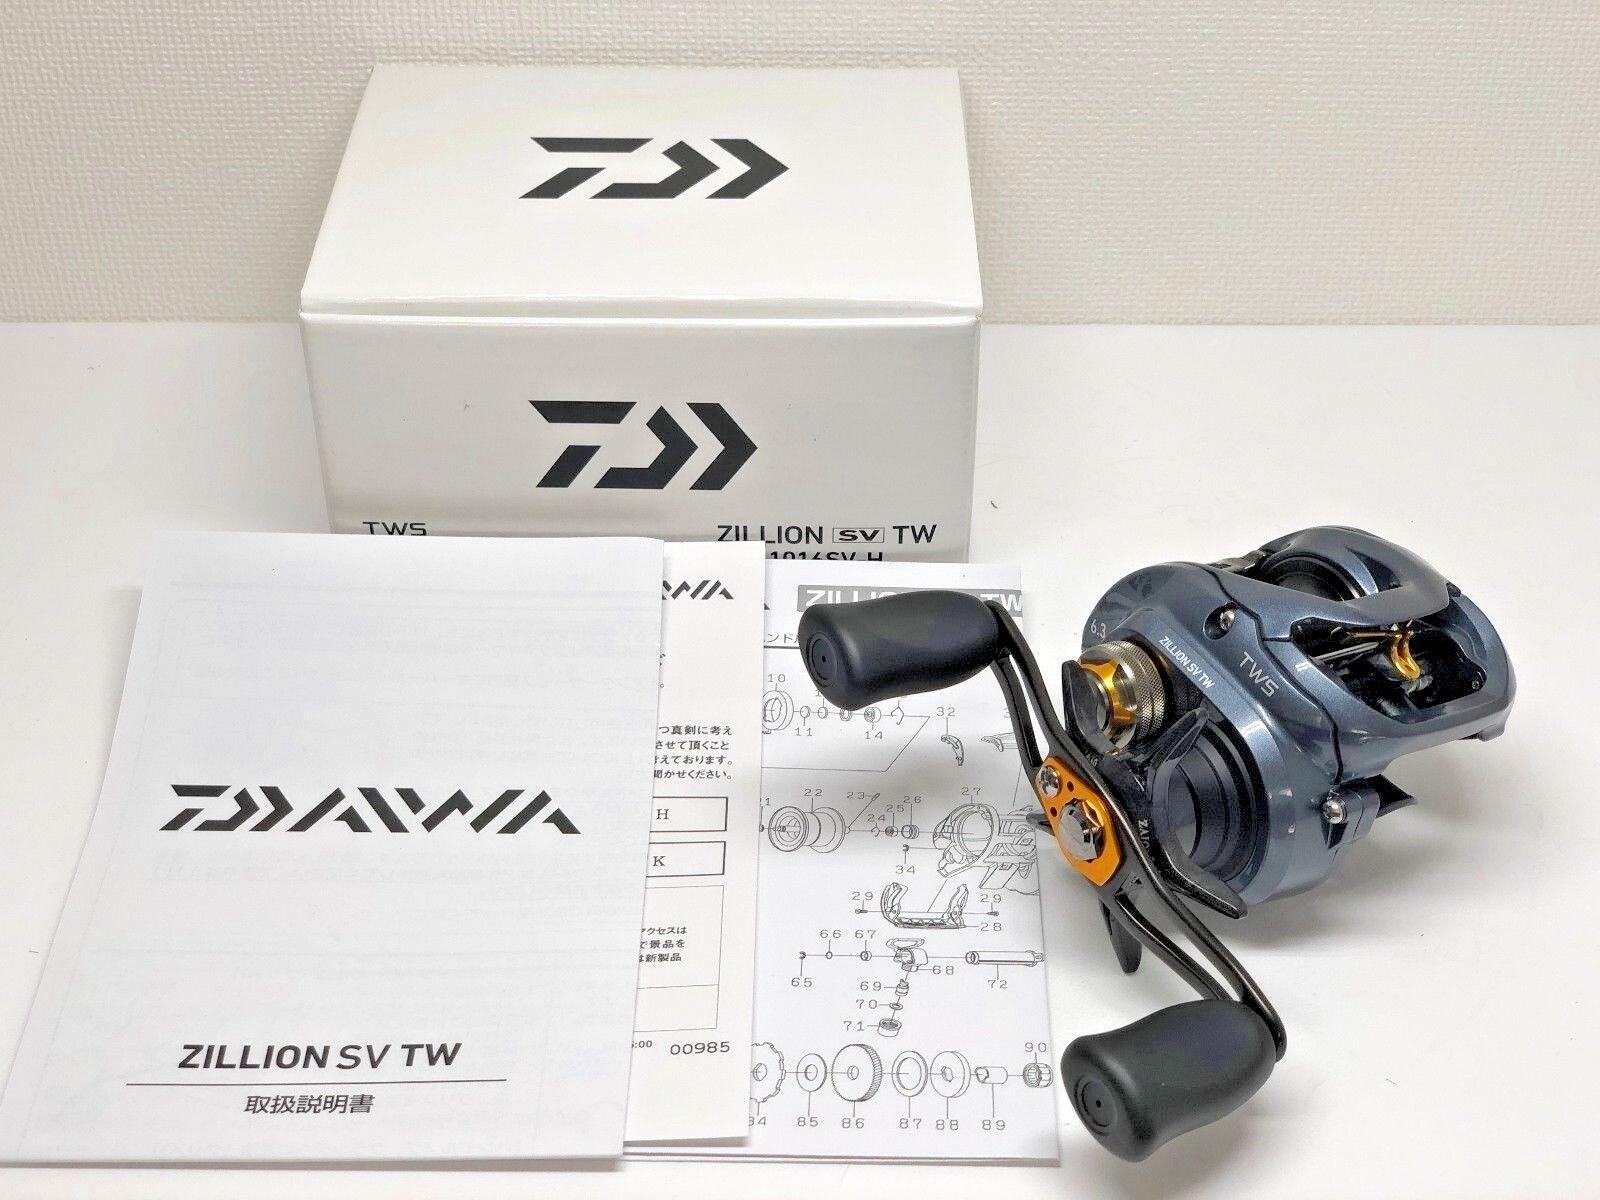 DAIWA 16 ZILLION SV TW 1016SV-H   - Free Shipping from Japan